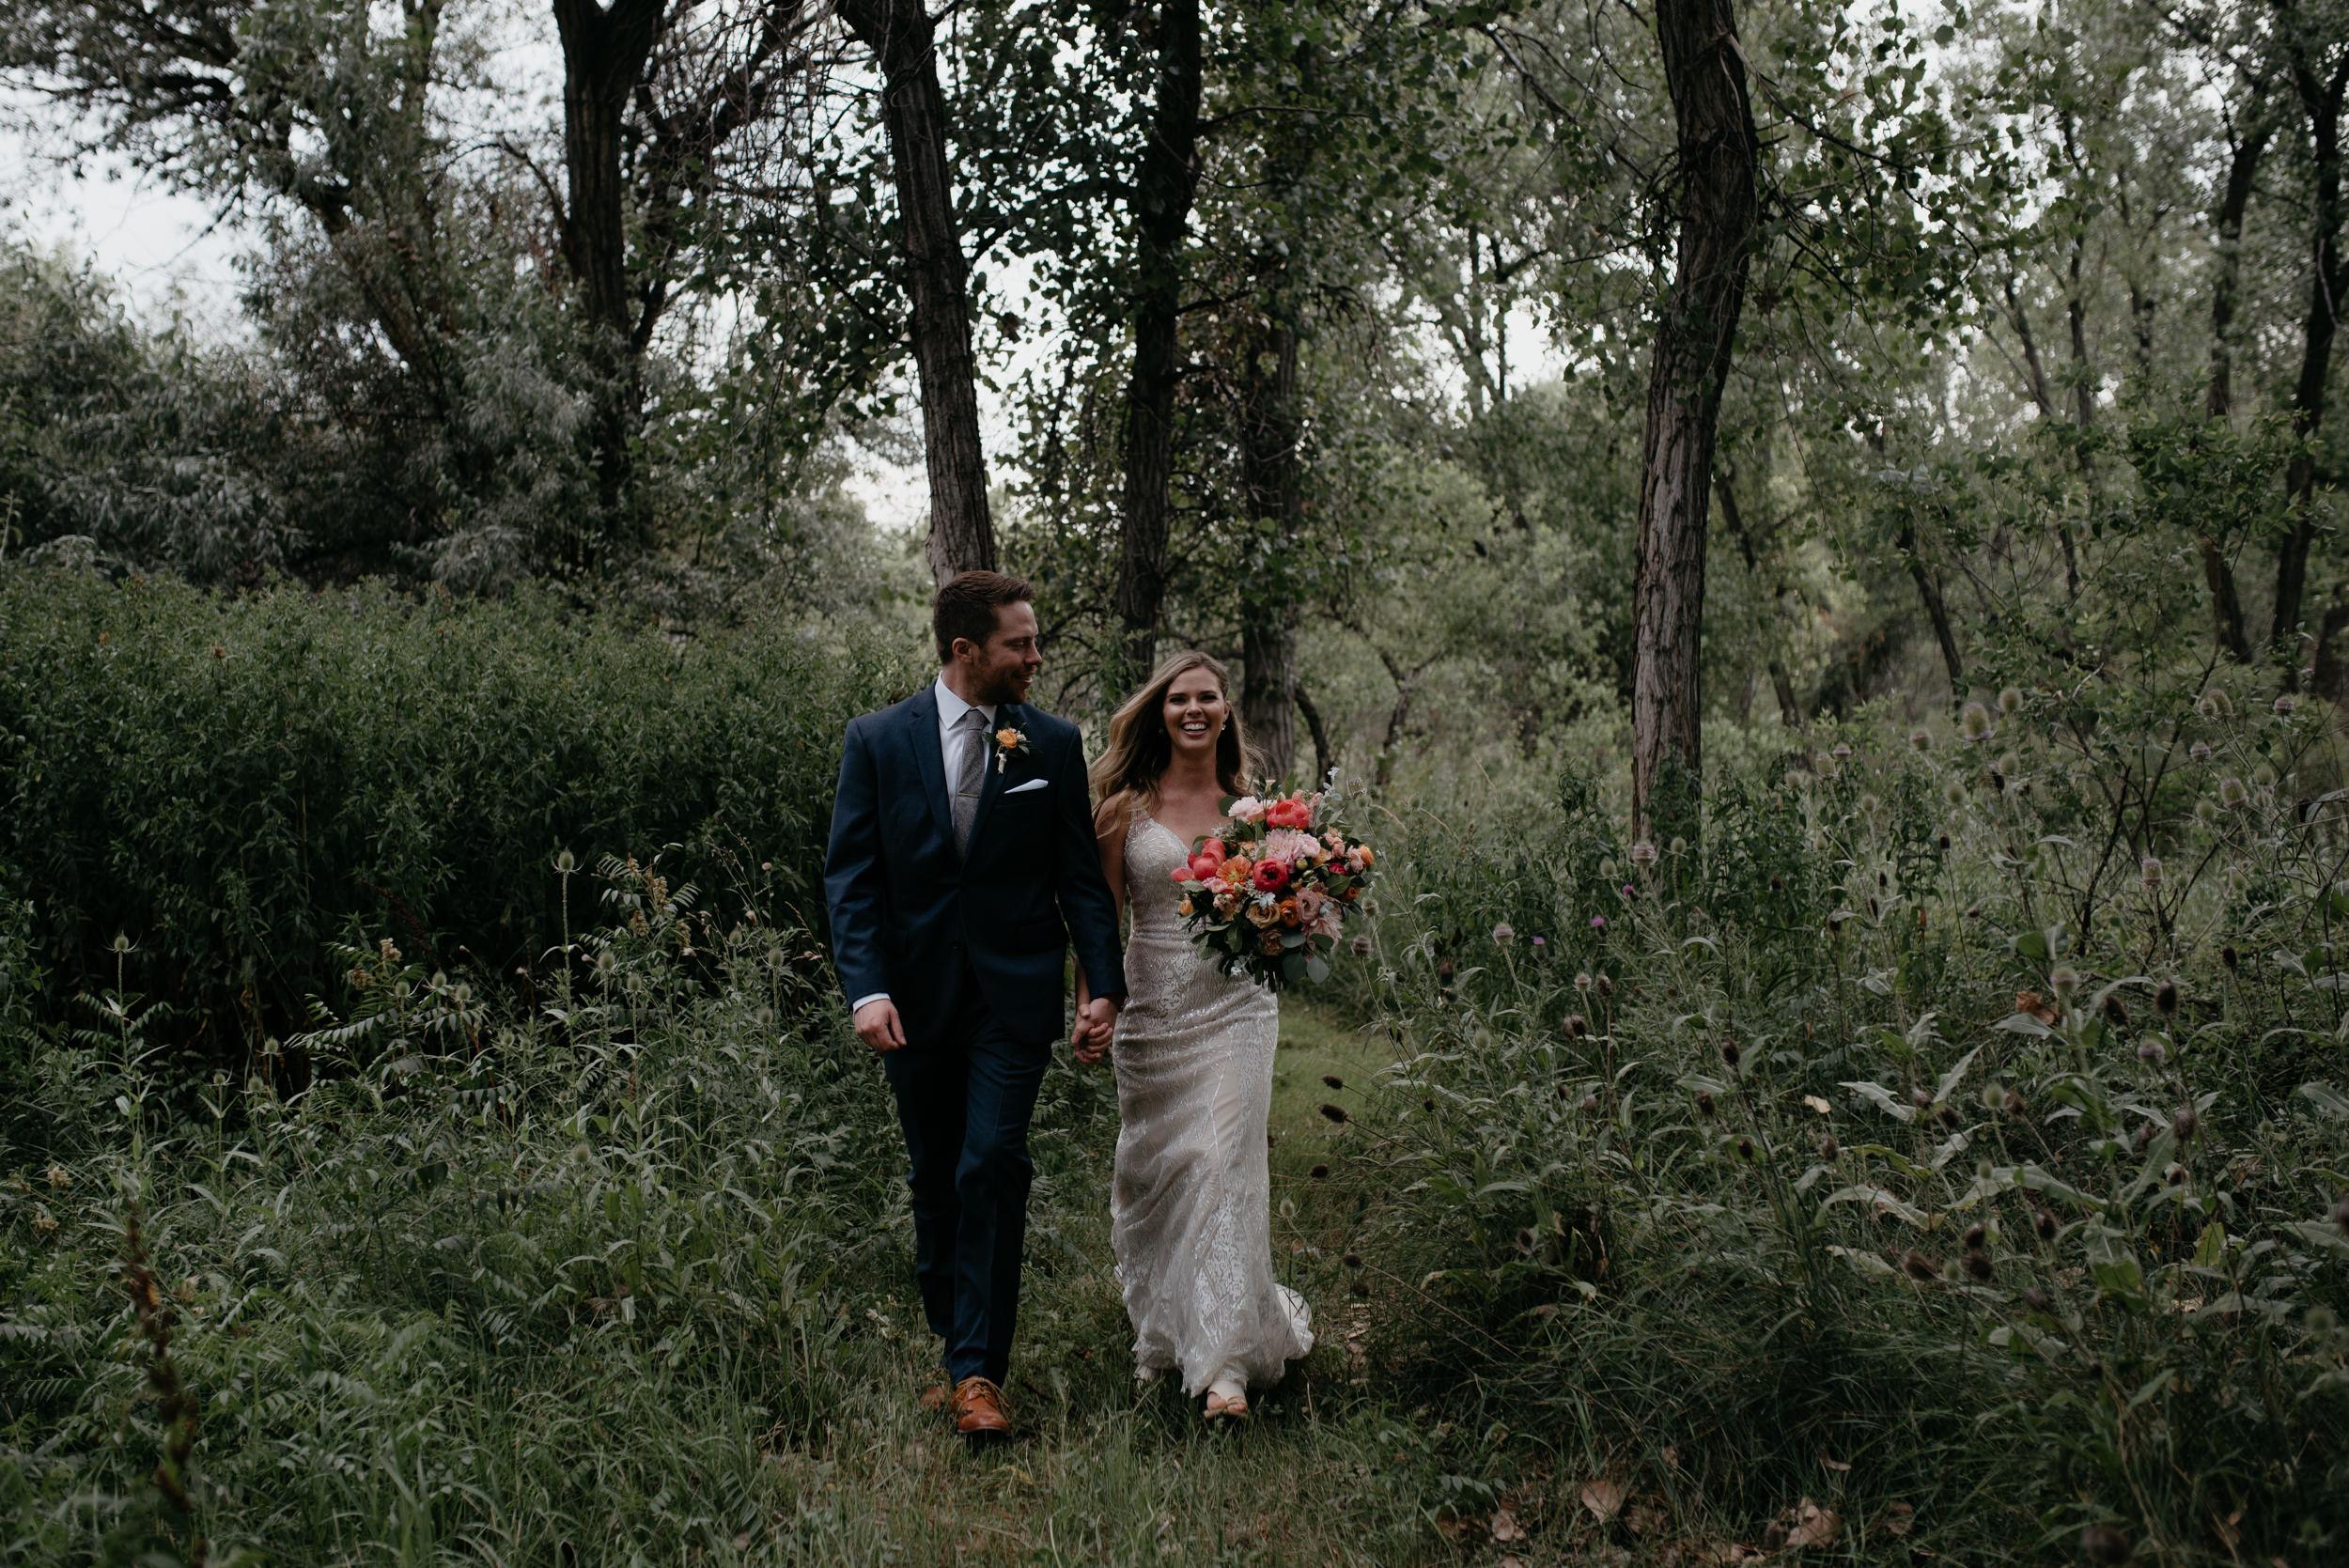 Boulder, Colorado adventure wedding and elopement photographer.